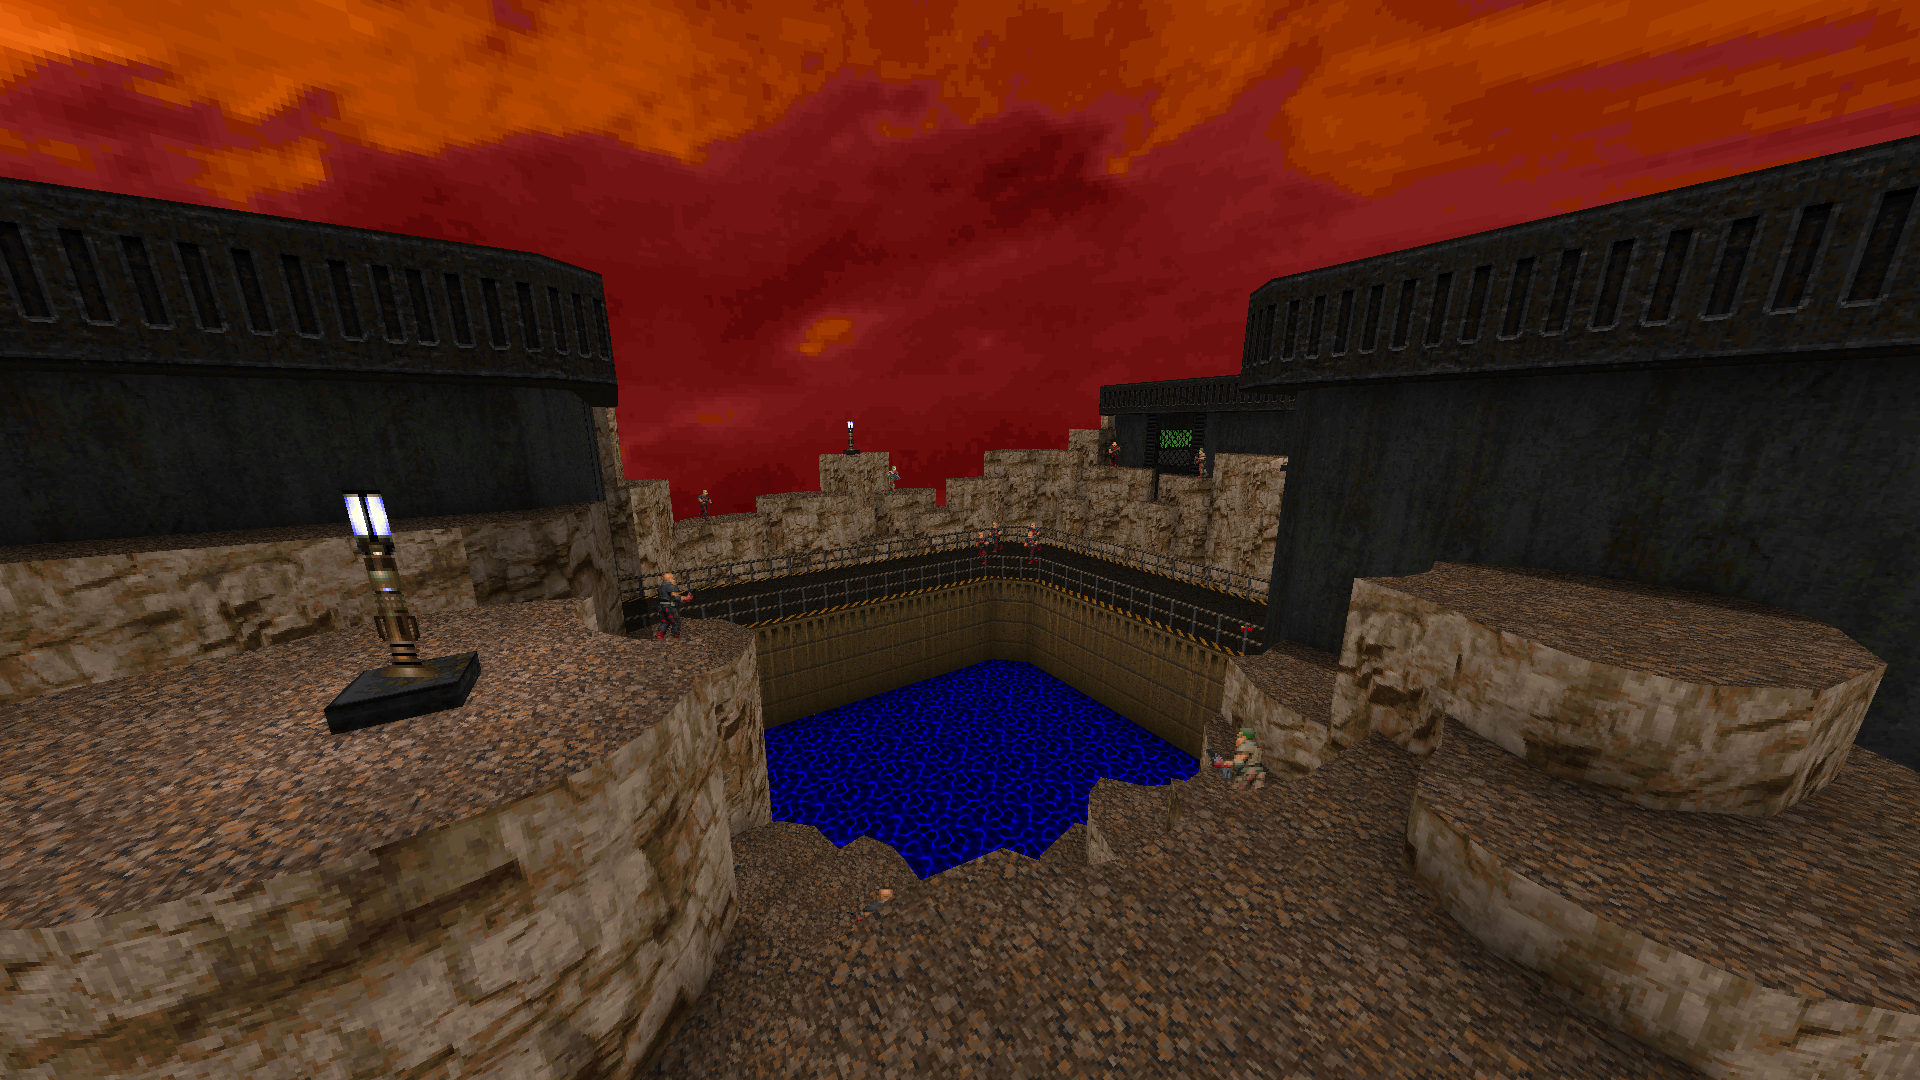 Screenshot_Doom_20210414_101248.png.4653b80df54932f3fa65f8327b50d9da.png